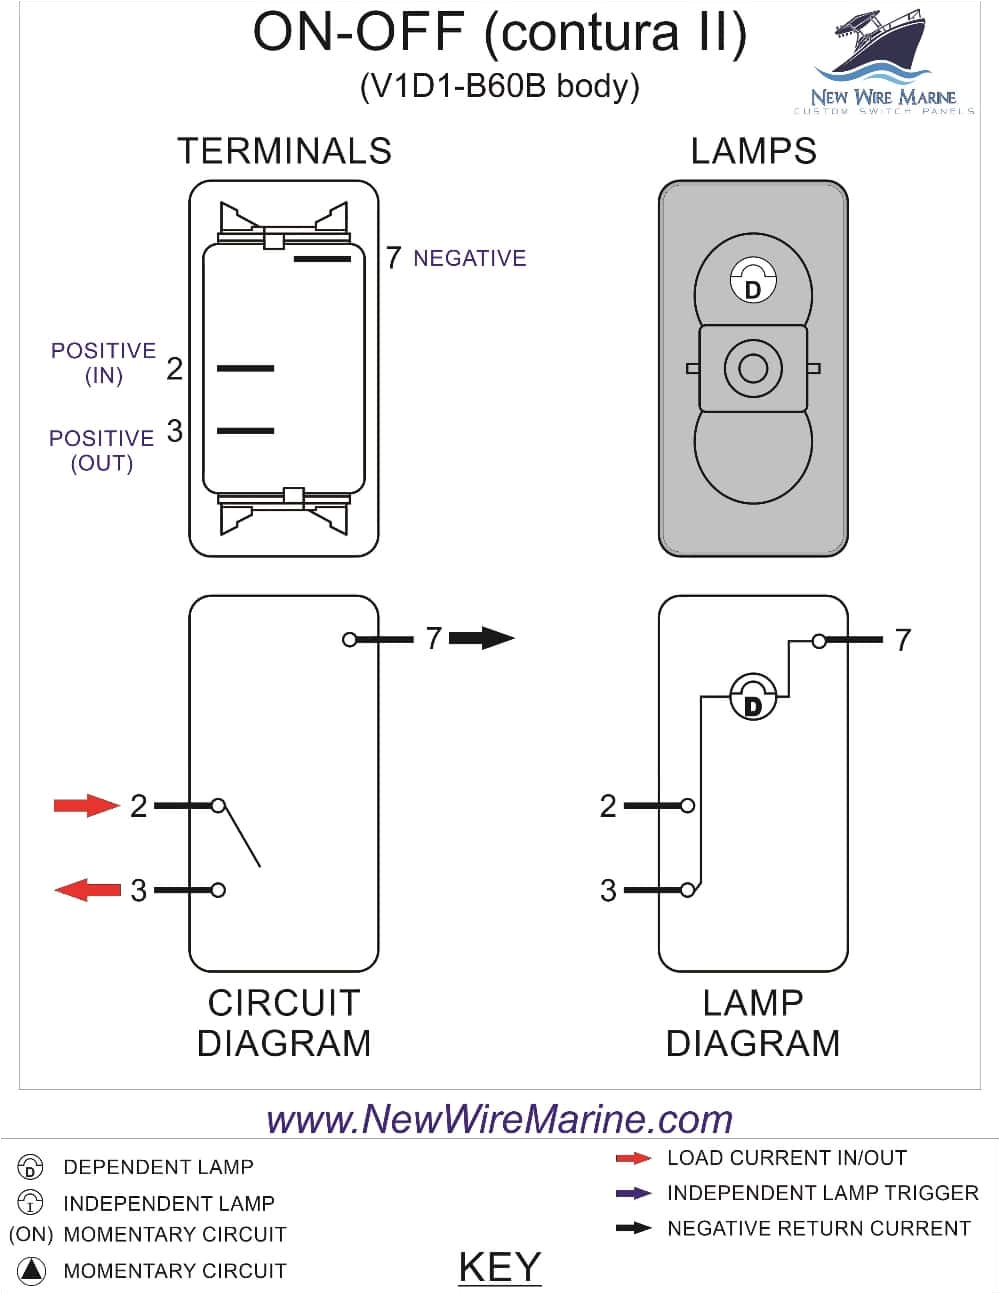 rigid k75 wiring diagram toggle switch wiring diagram new how to wire a toggle switch wiring